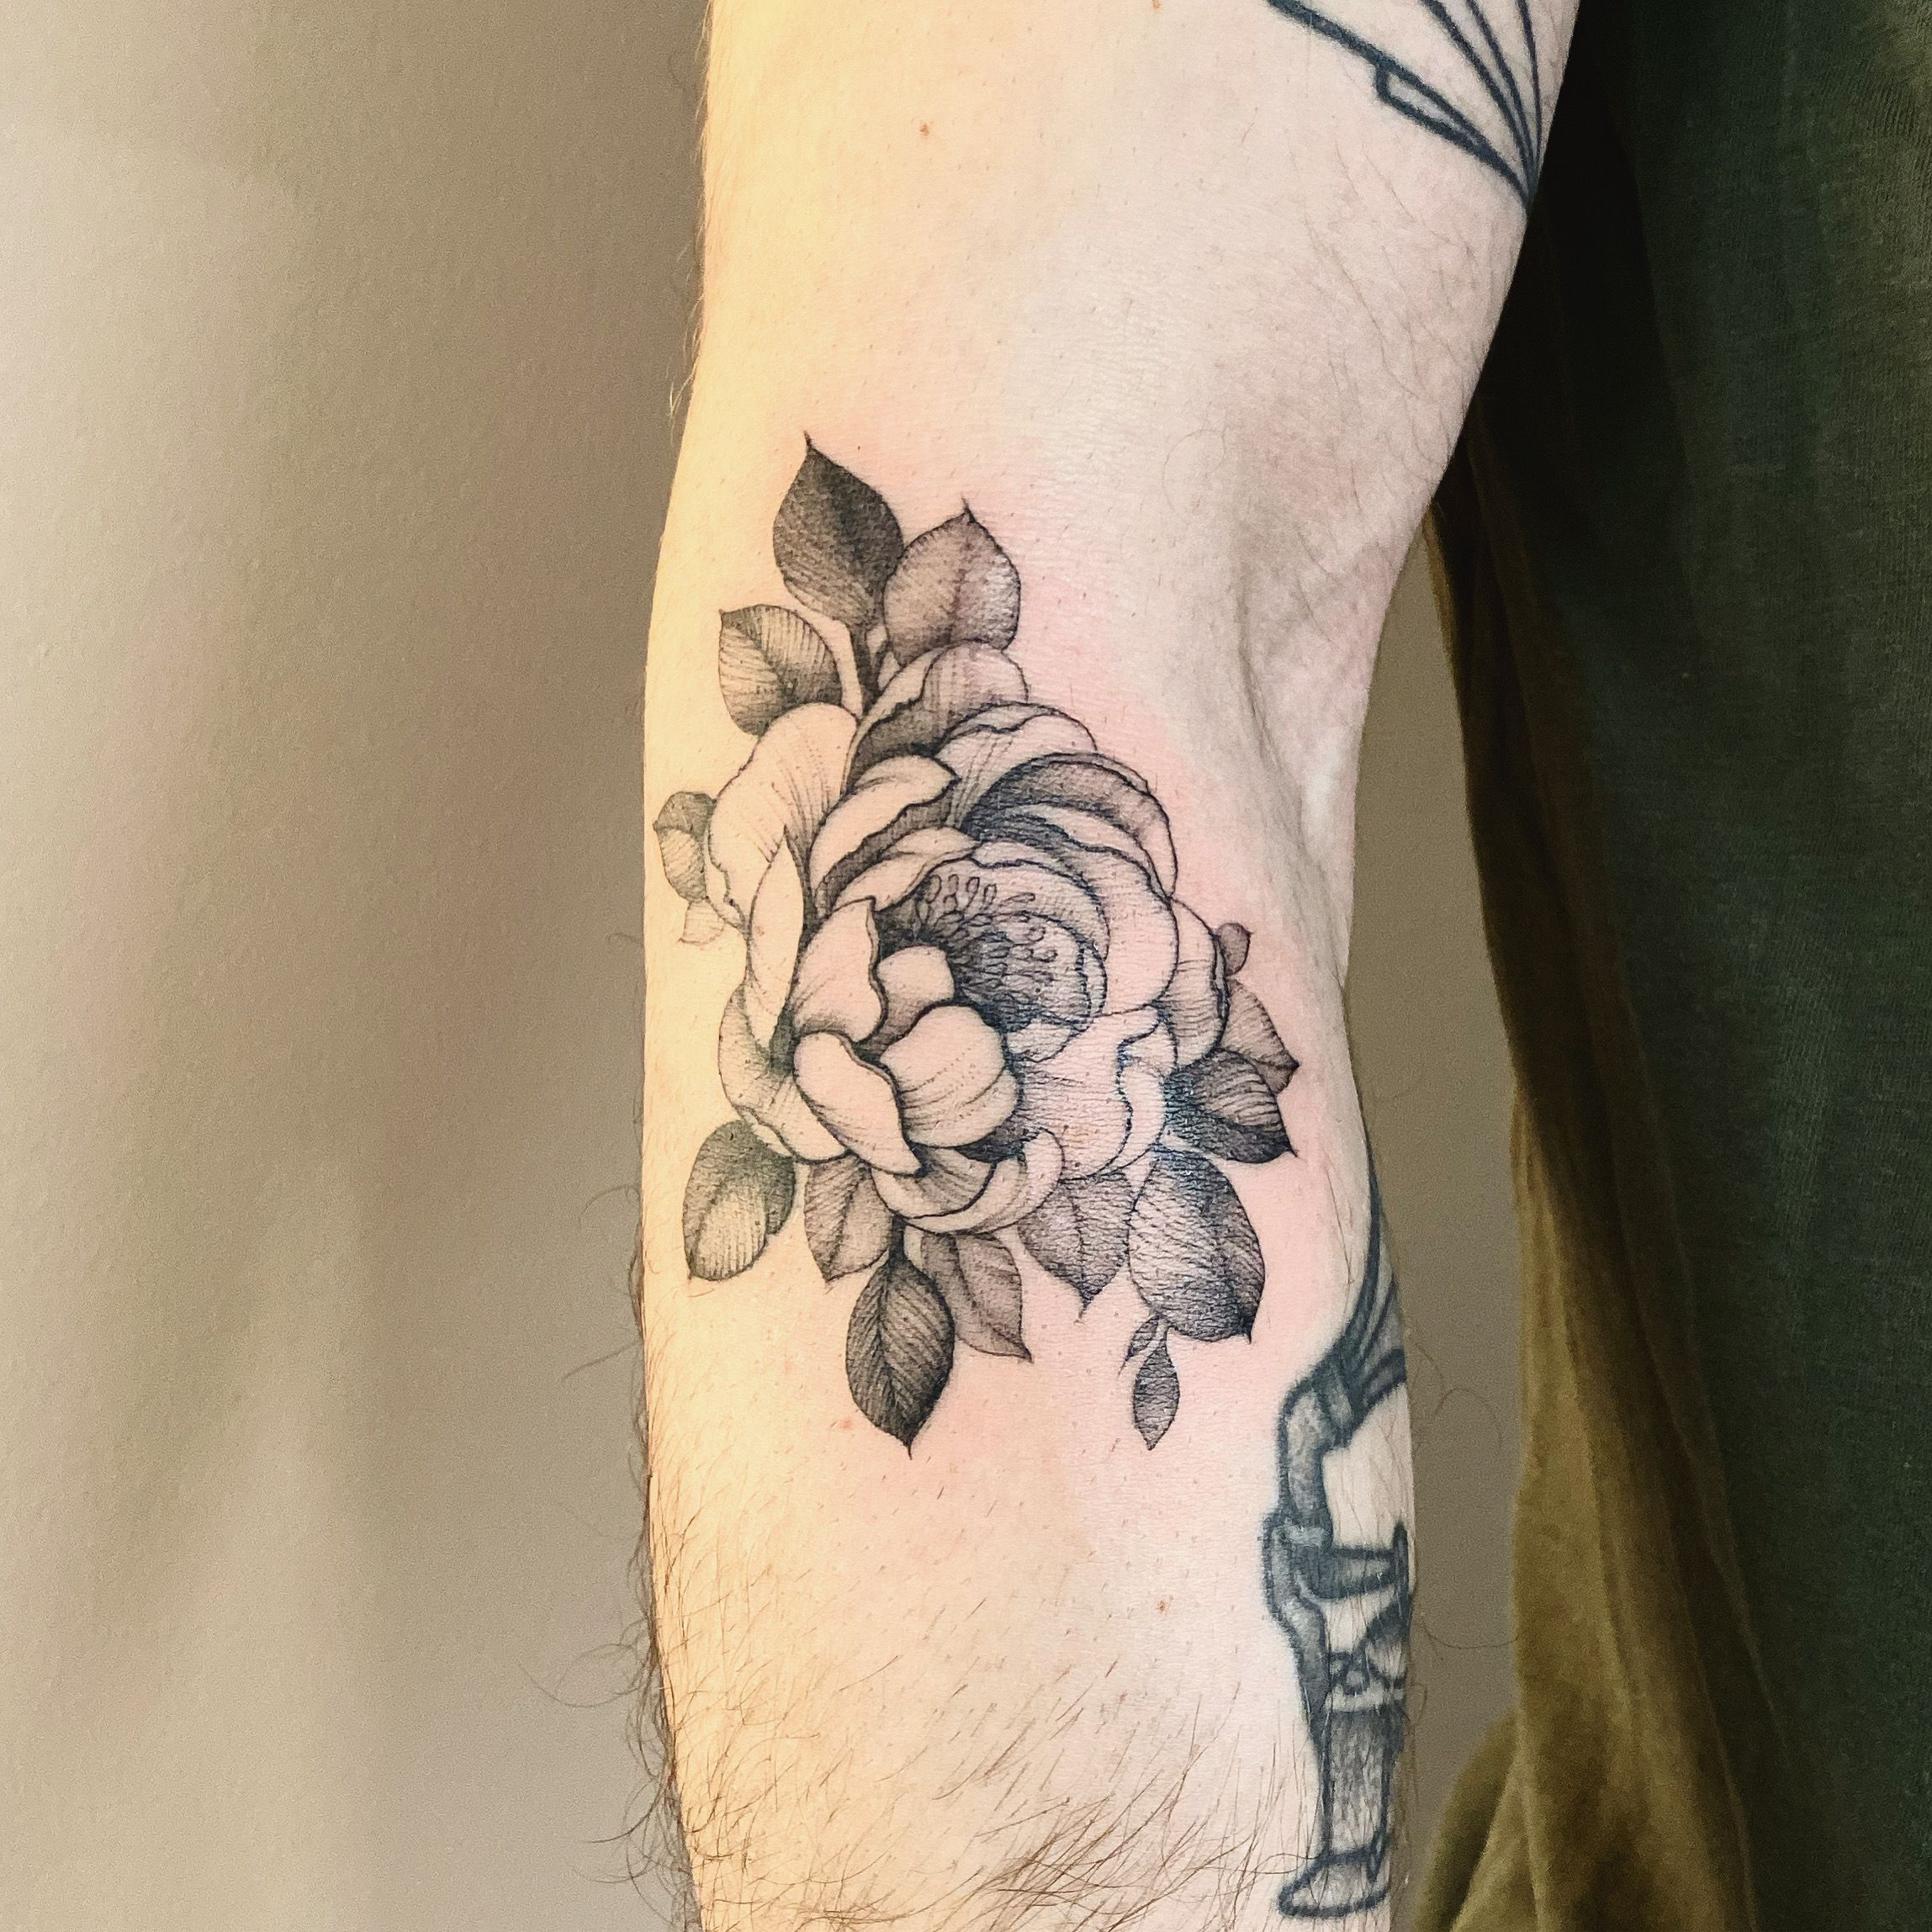 #peonytattoo done @physalistattoo 🌹 #tattoo #fineline #fineliner #tats #tattooparis #paris #ink #inked #instaink #inkedlife #instagram #tattoofloralparis #singleneedle #tattoofloral #paris #paristattoo #instatattoo #instainked  #tatouee #tatouage  #flowertattoo #carinsilvertattoo  #fleurtattoo  #tattoofloral